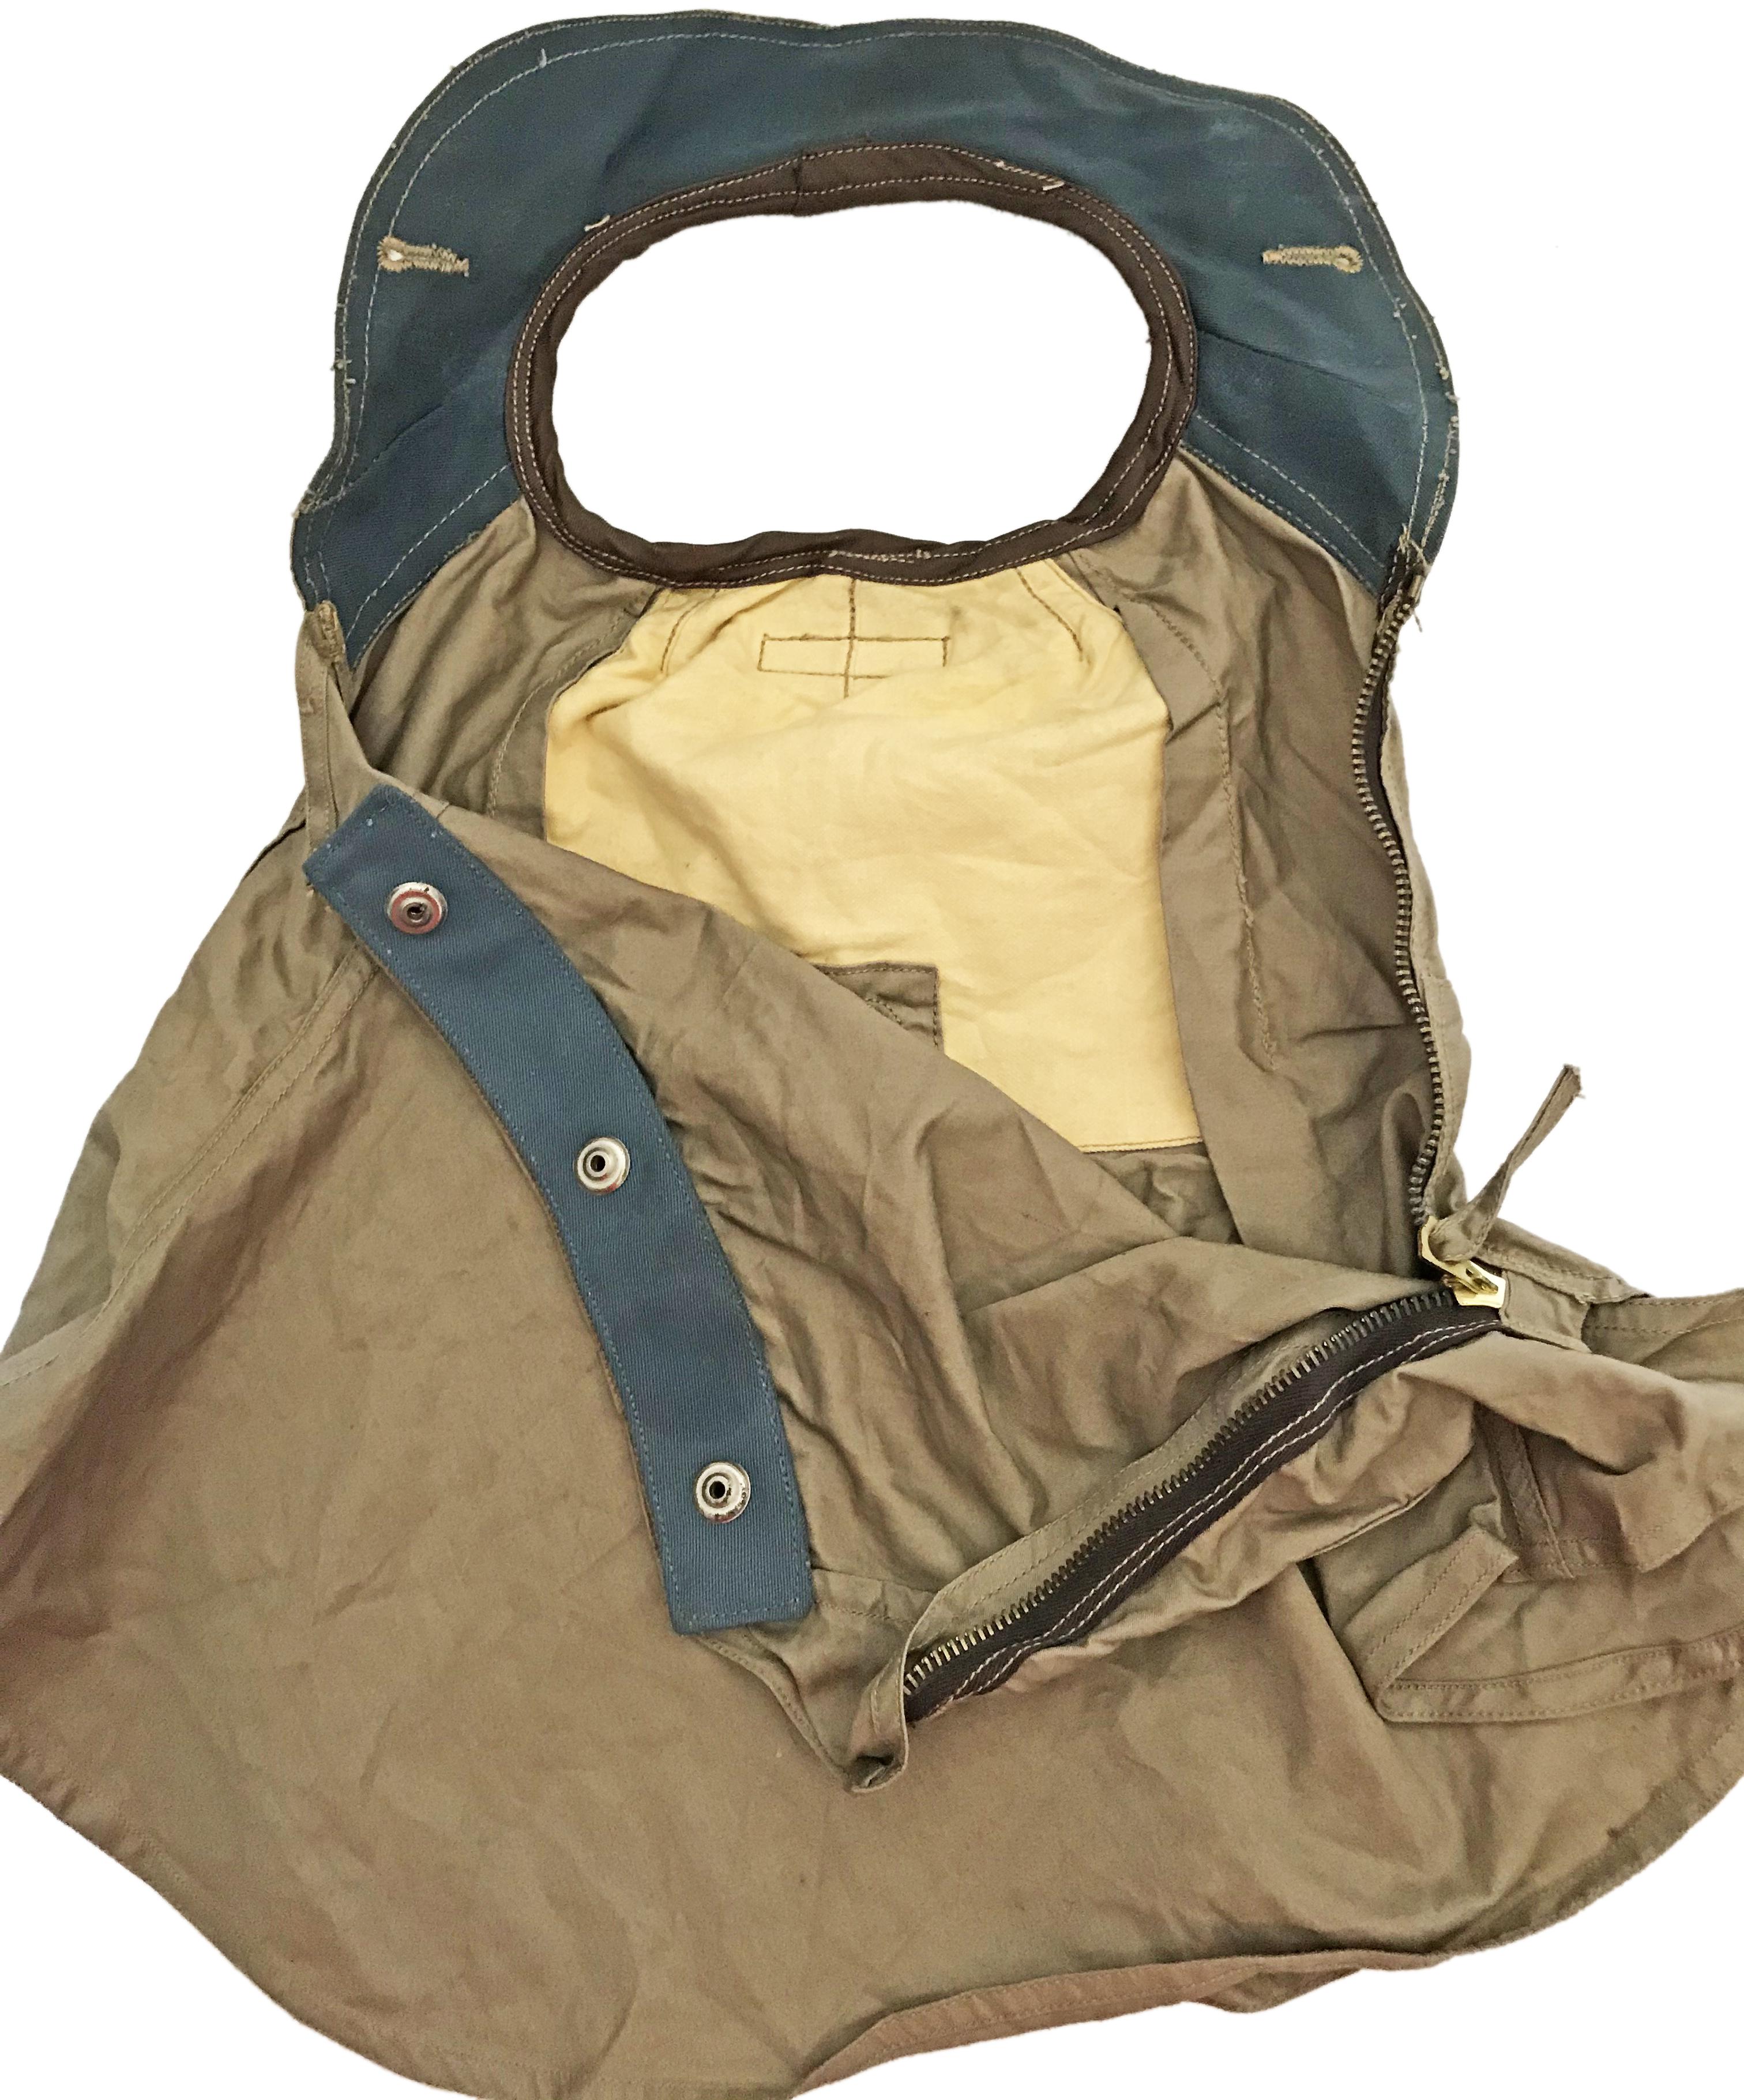 RAFGunner's hood/mask protector